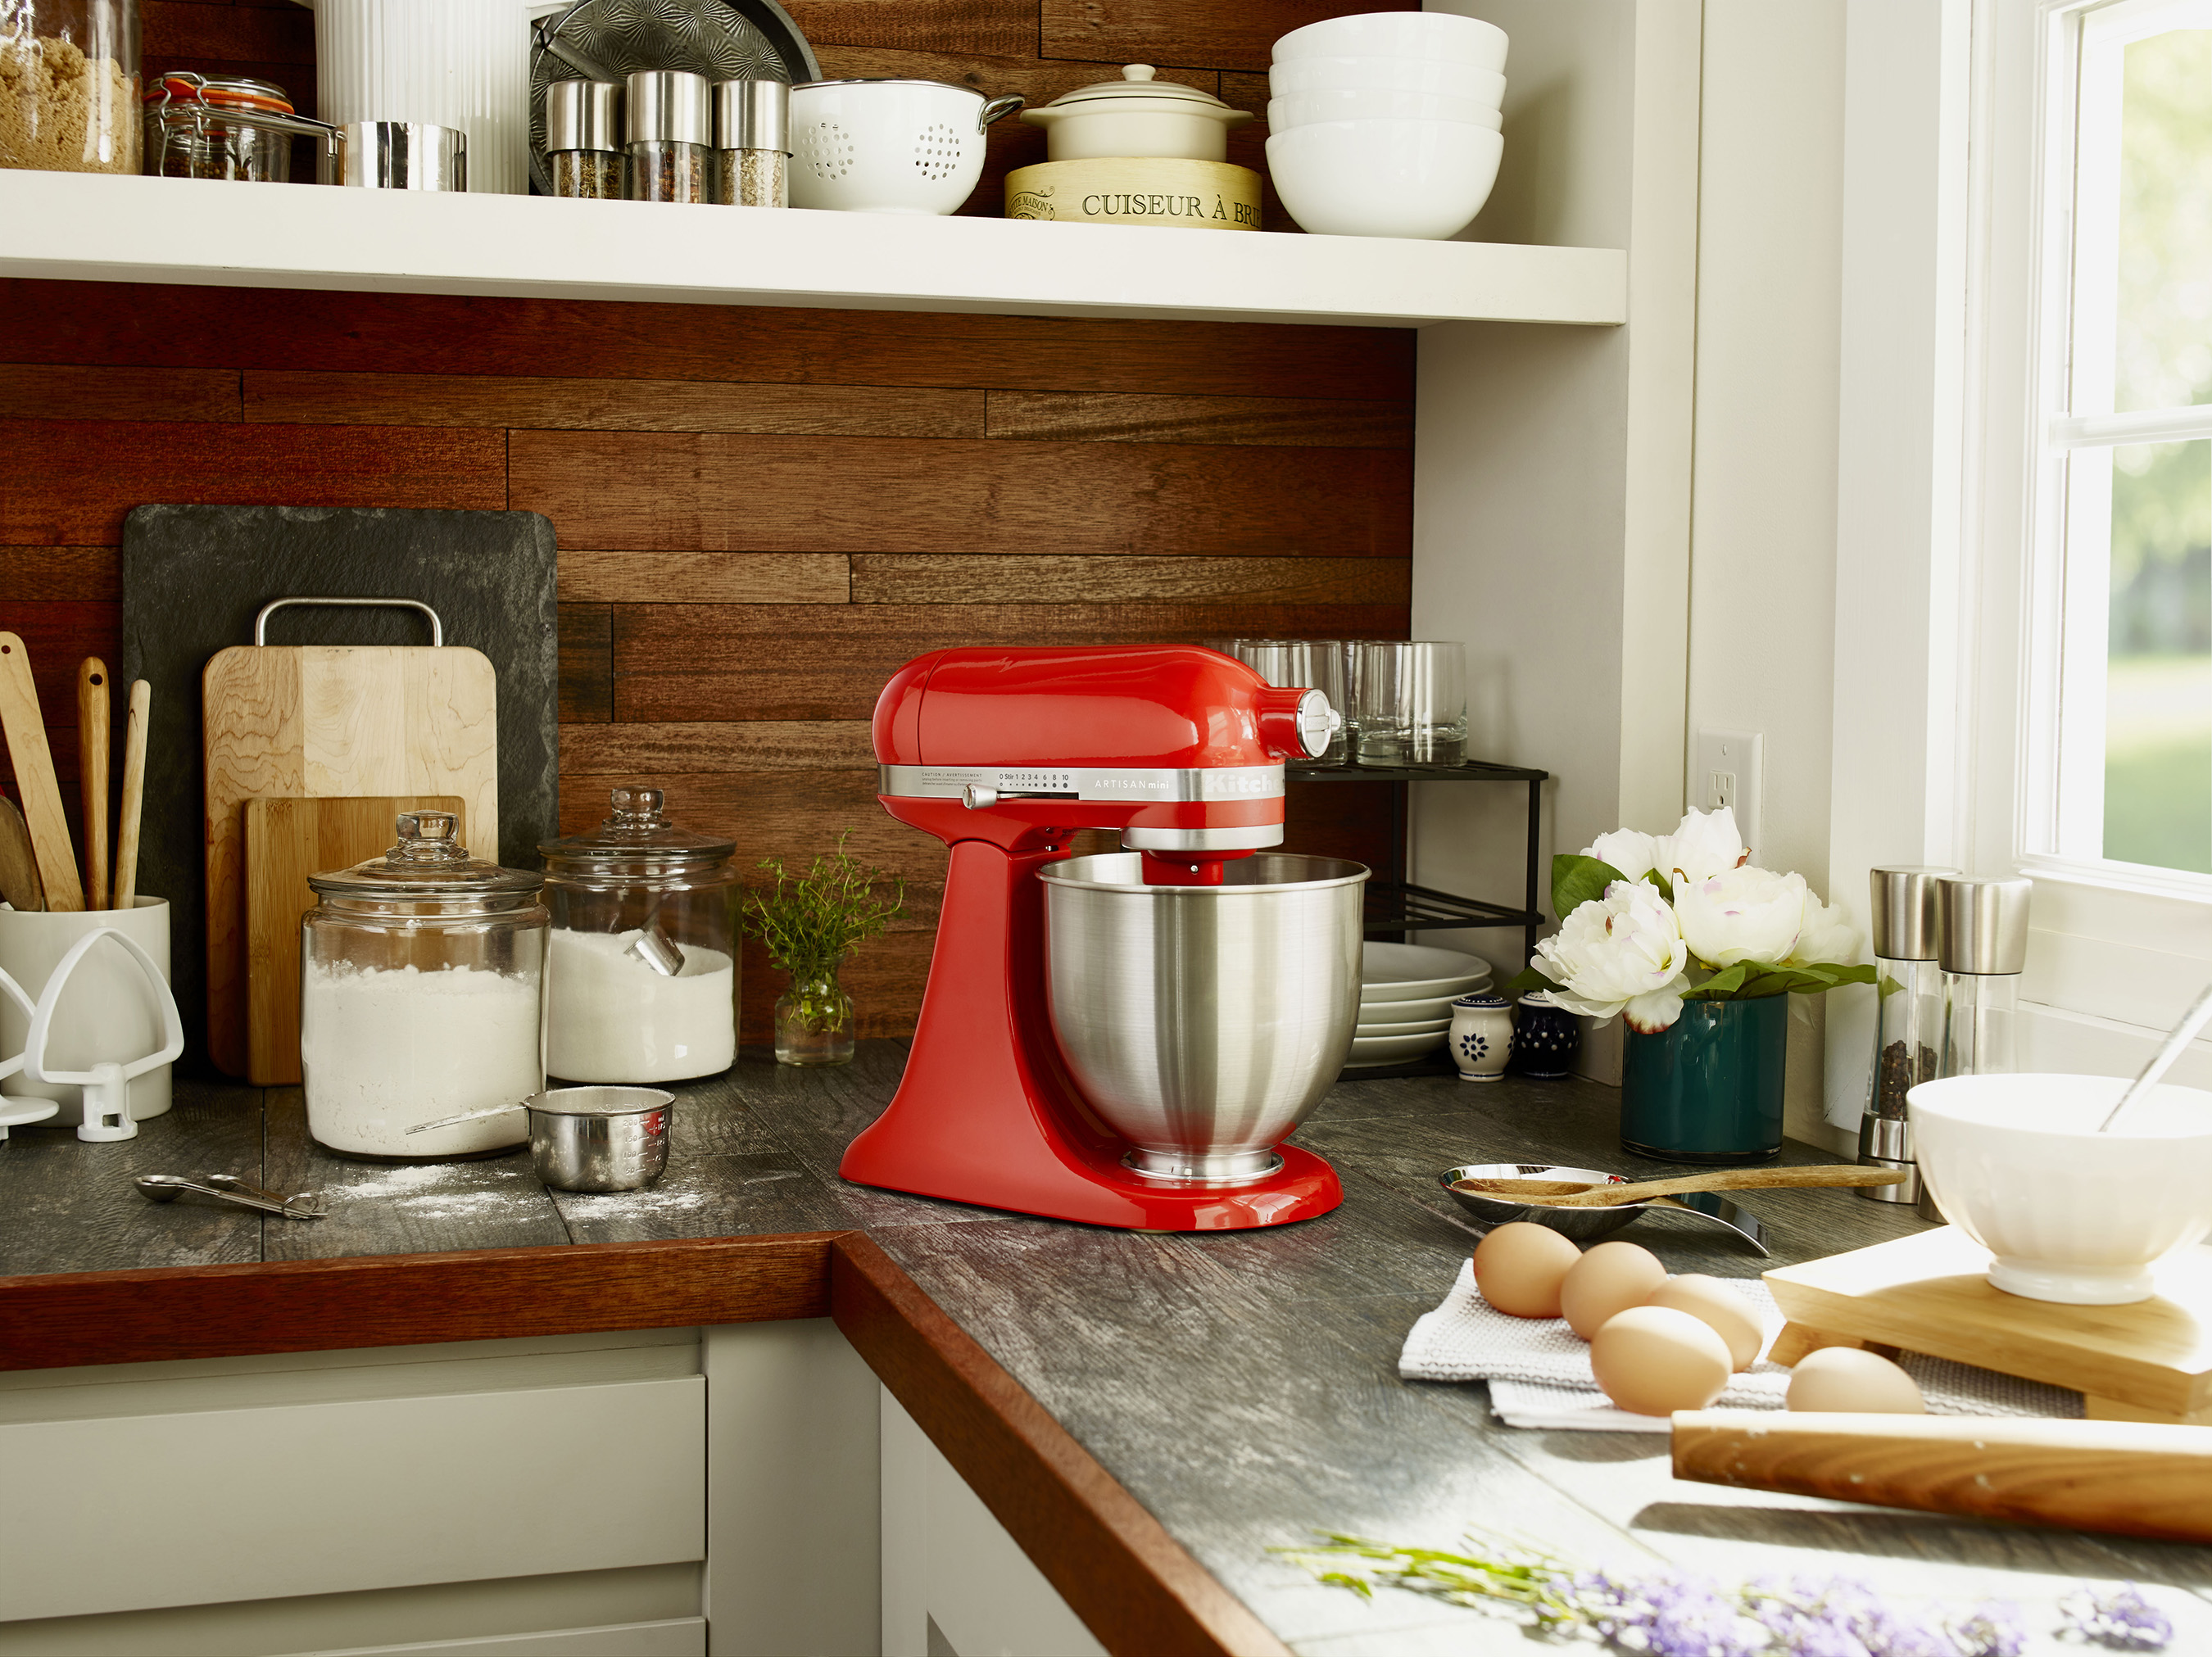 New Kitchenaid 174 Stand Mixer Small Yet Mighty